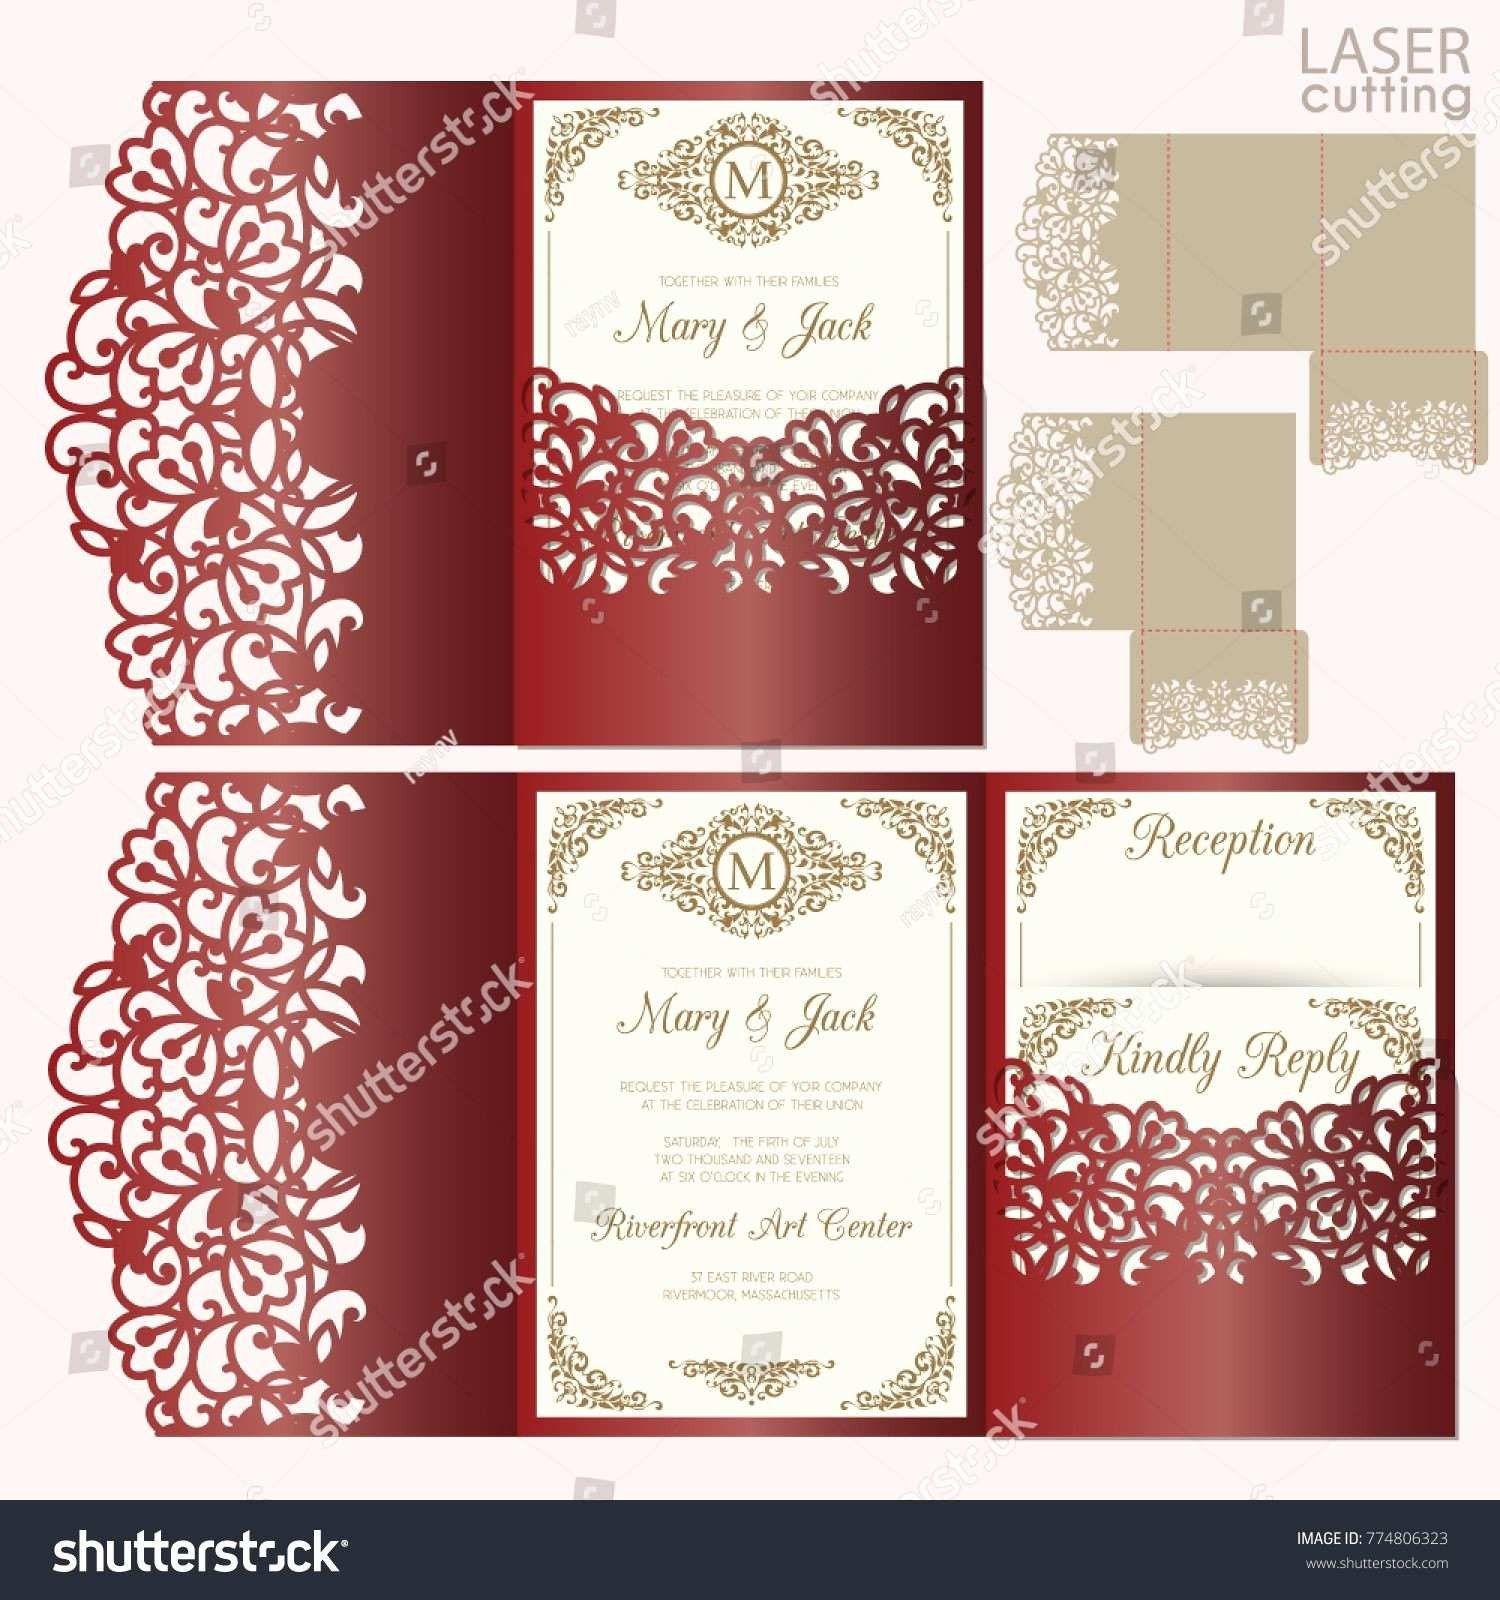 Wedding Invitation Template Illustrator Best Of Illustrator